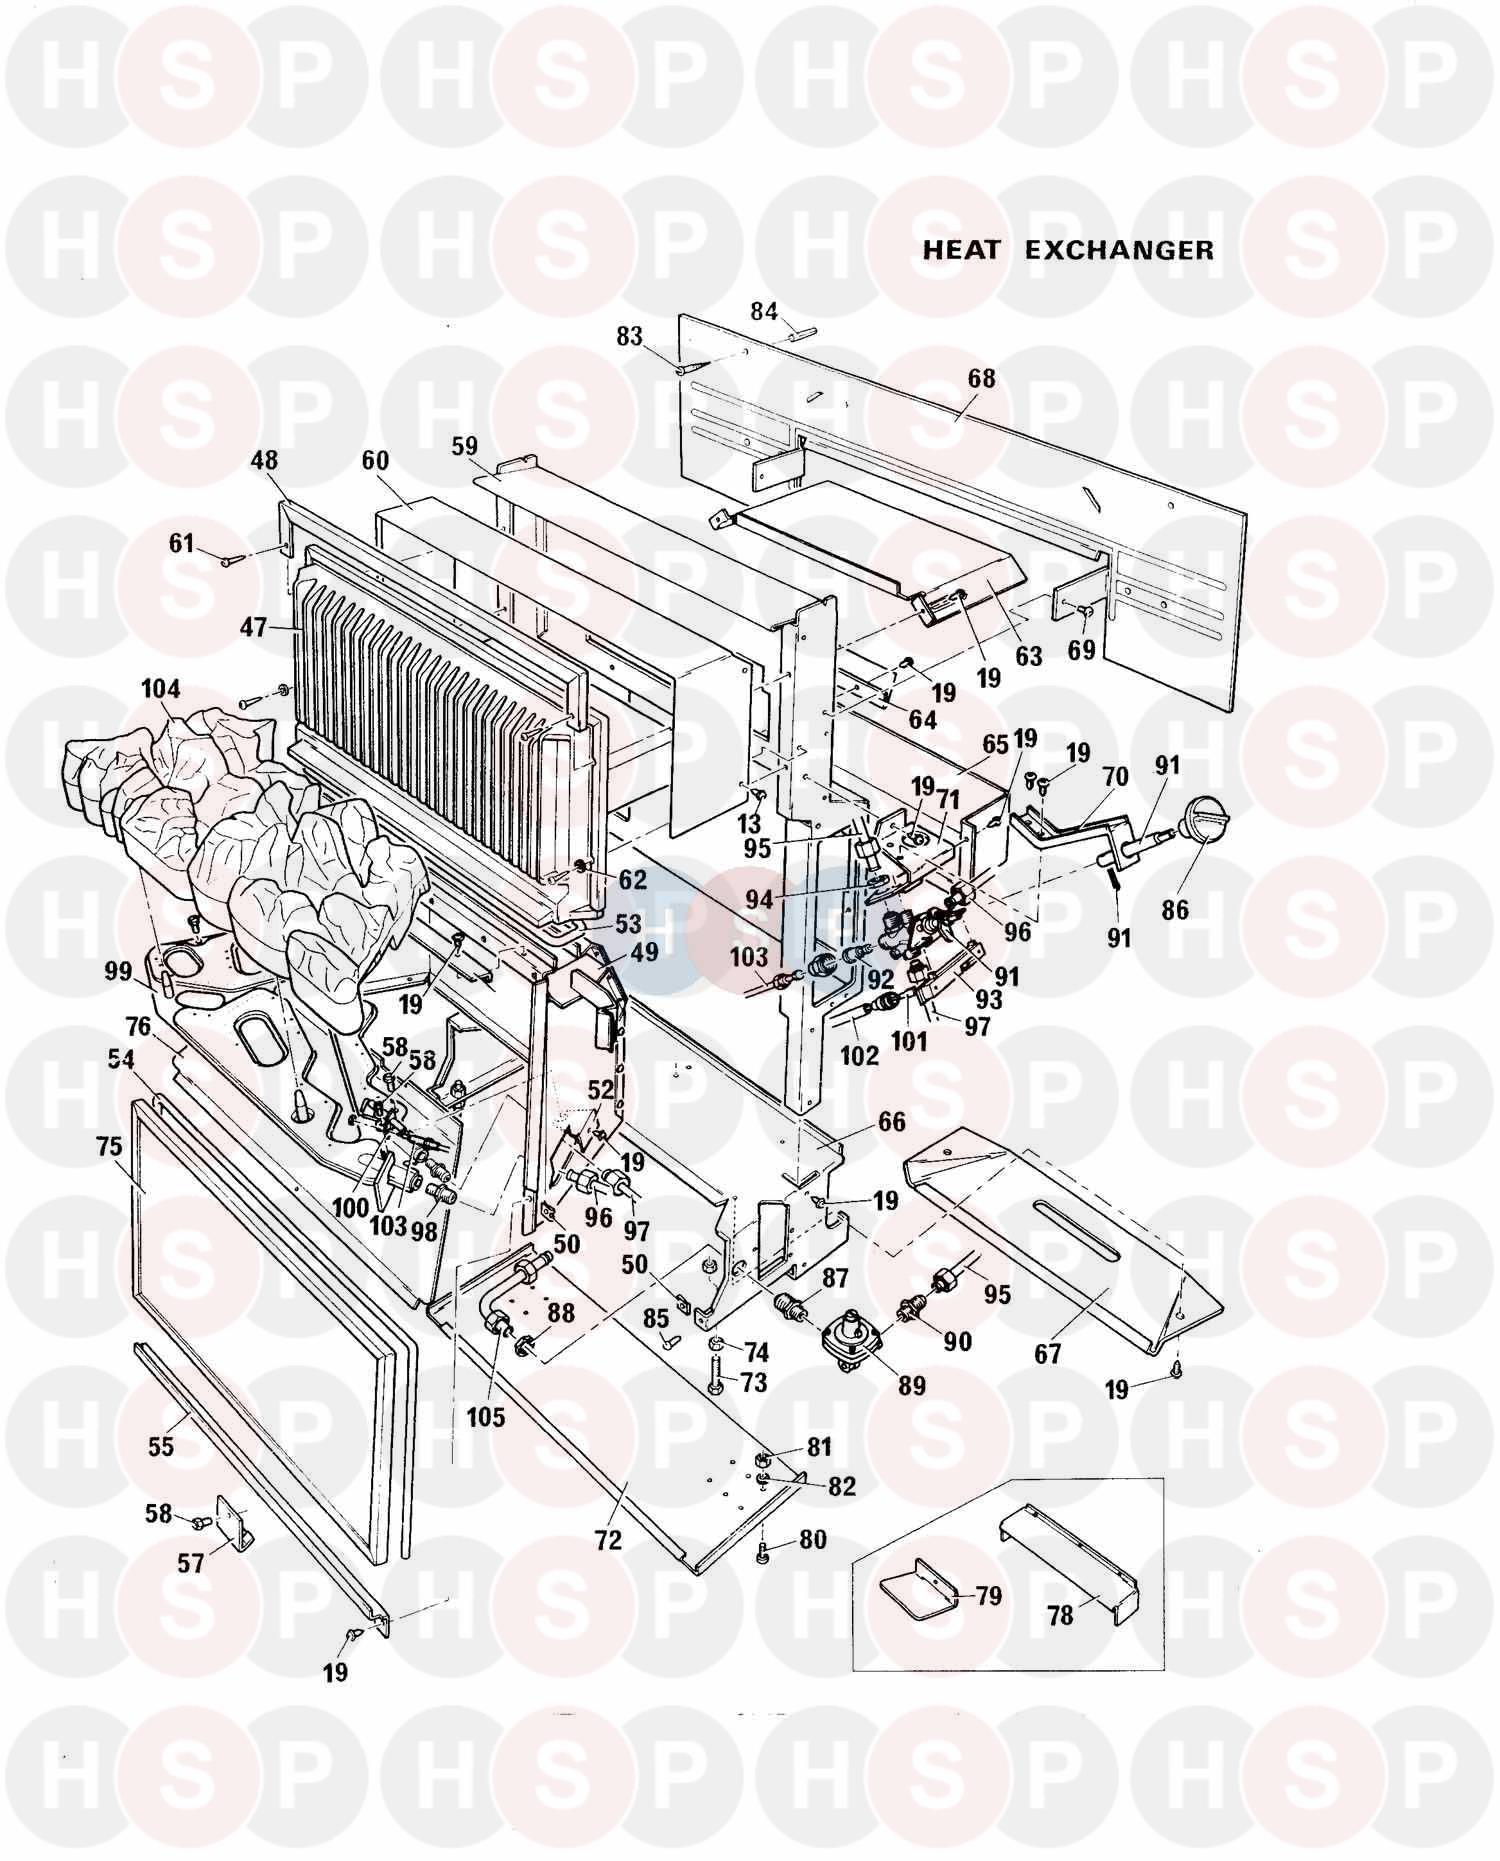 Baxi bermuda lfe 3 super appliance diagram heat exchanger for Baxi eco 3 manuale